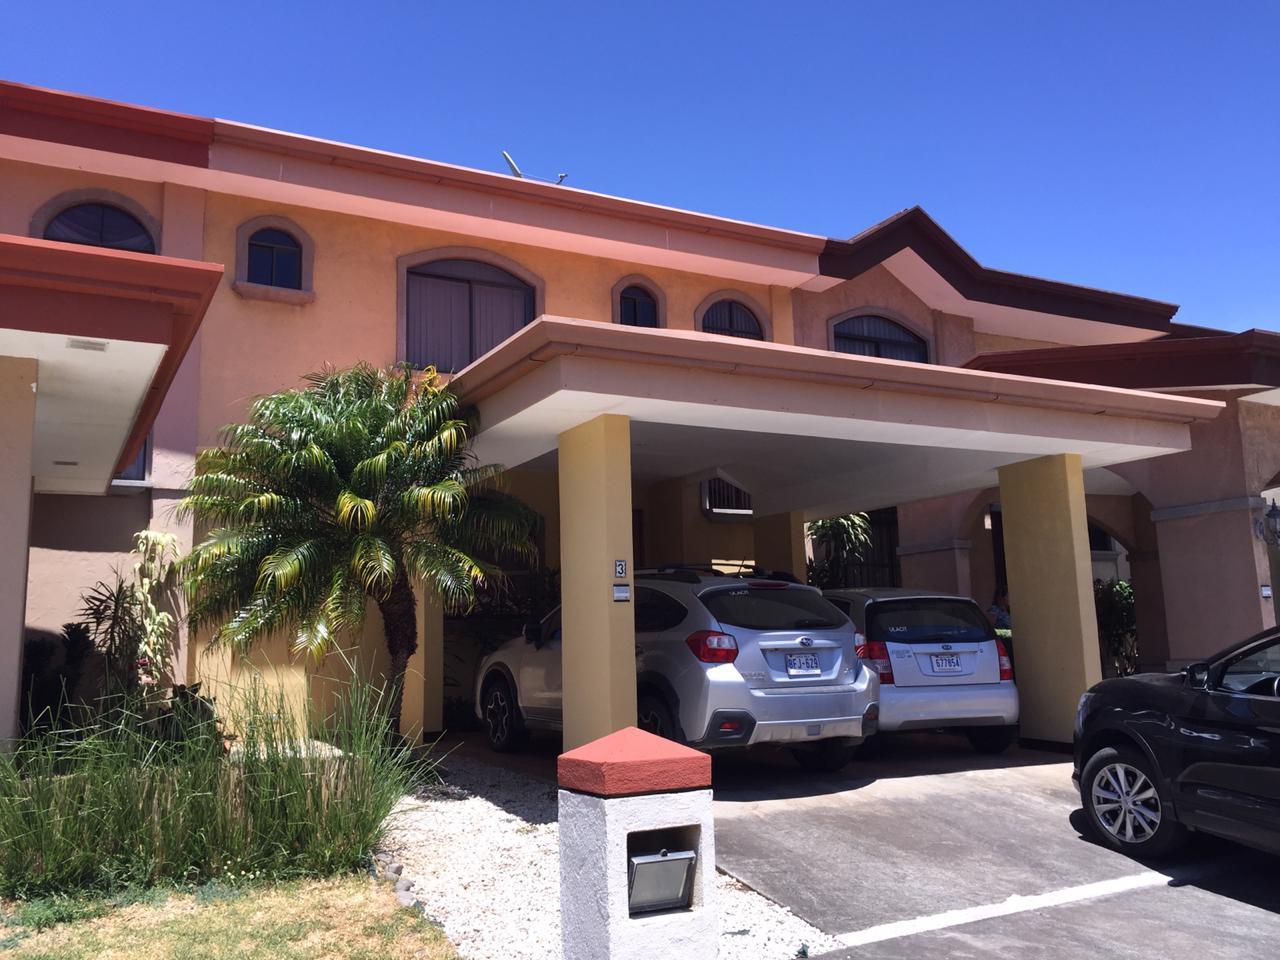 2360 ¡Casa Amplia en exclusivo Residencial Pozos de Santa Ana!